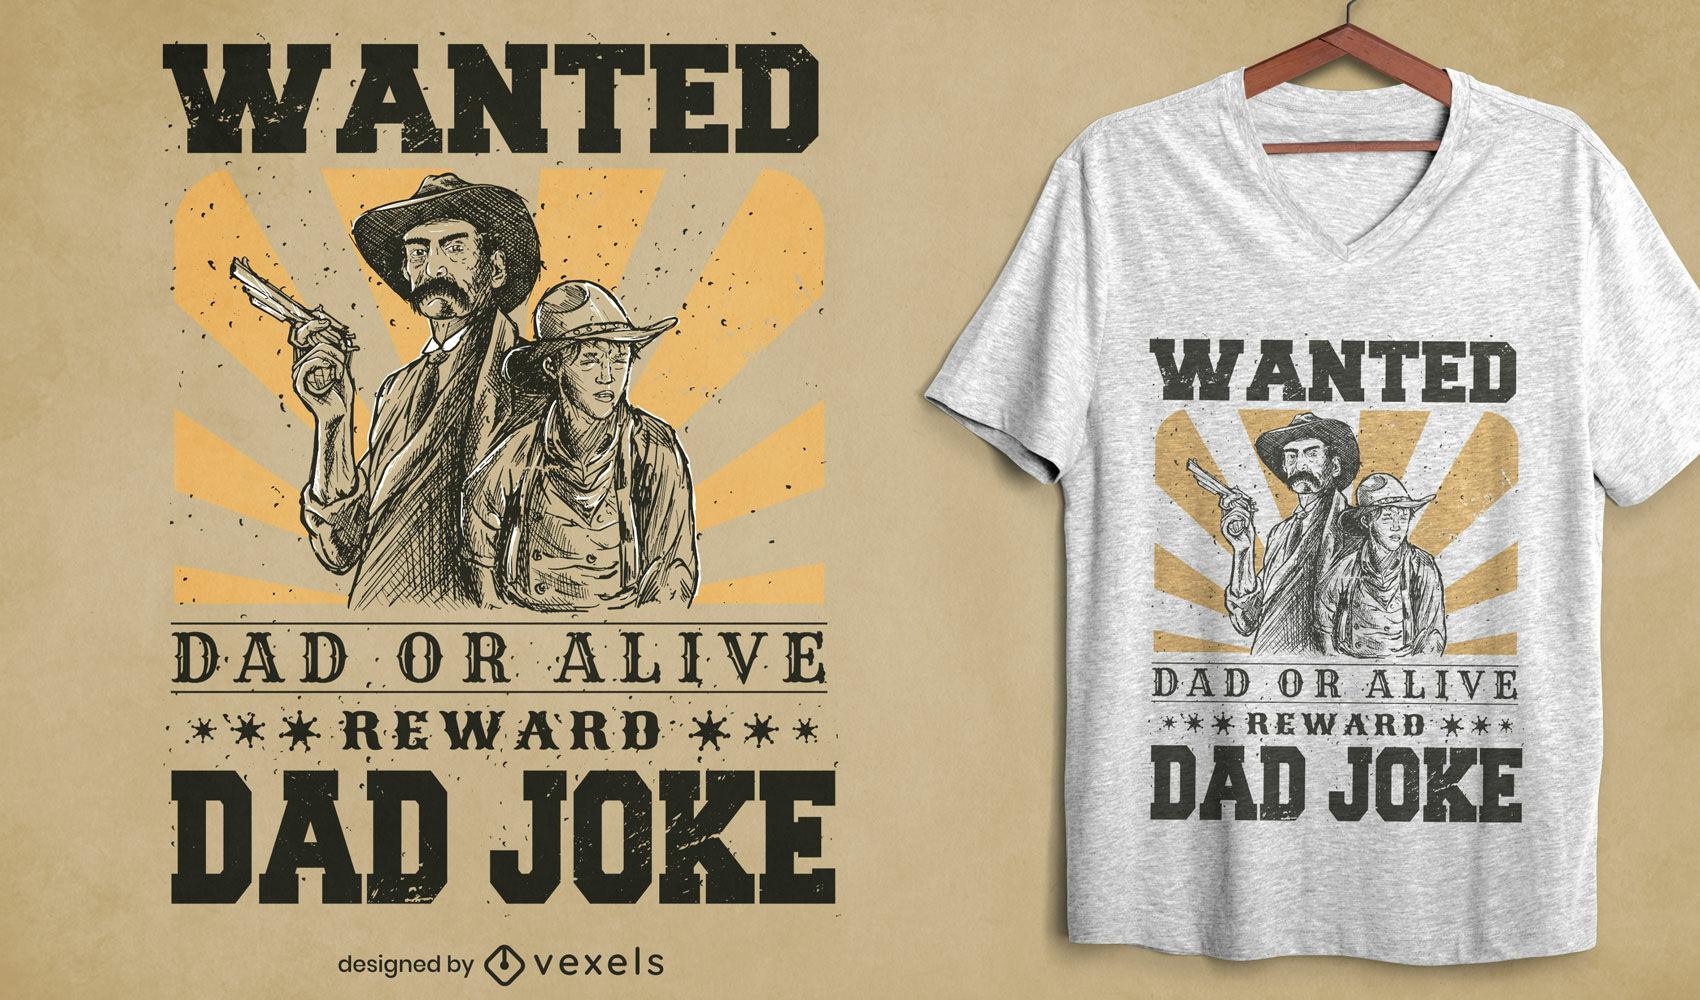 Dad joke western wanted sign t-shirt design